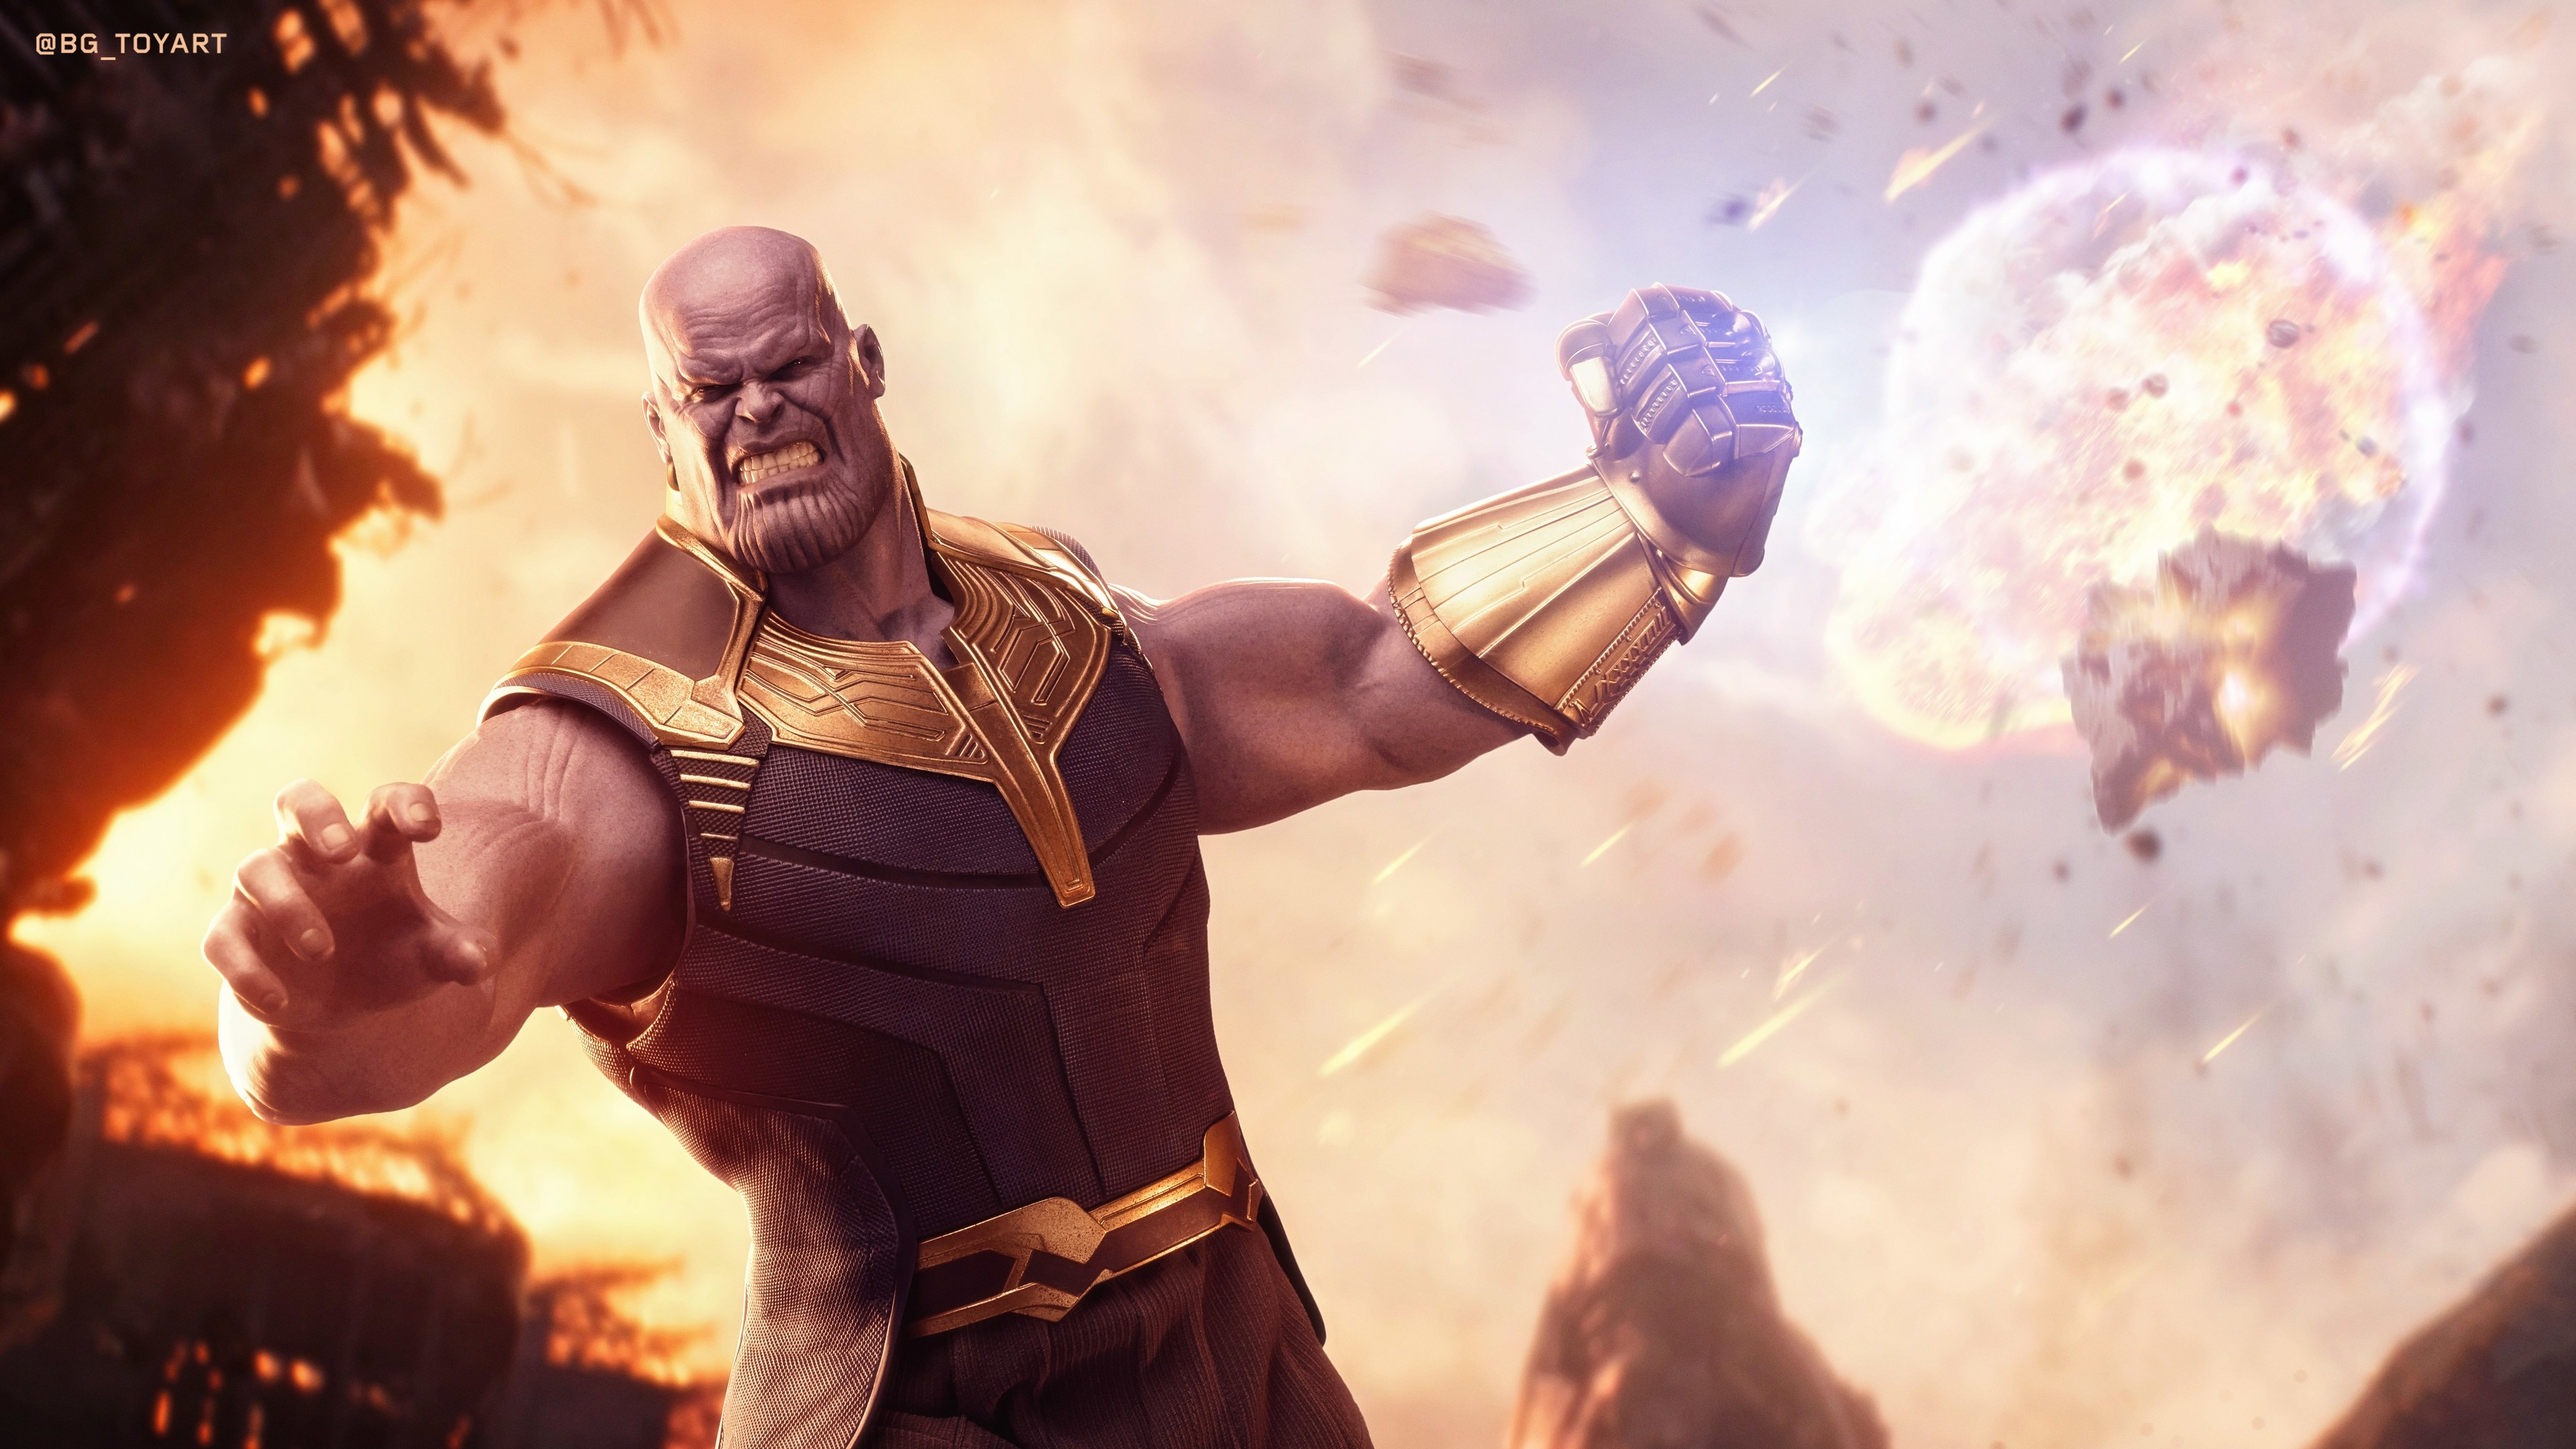 Wallpaper 4k Thanos Avengers Infinity War 4k 4k Wallpapers